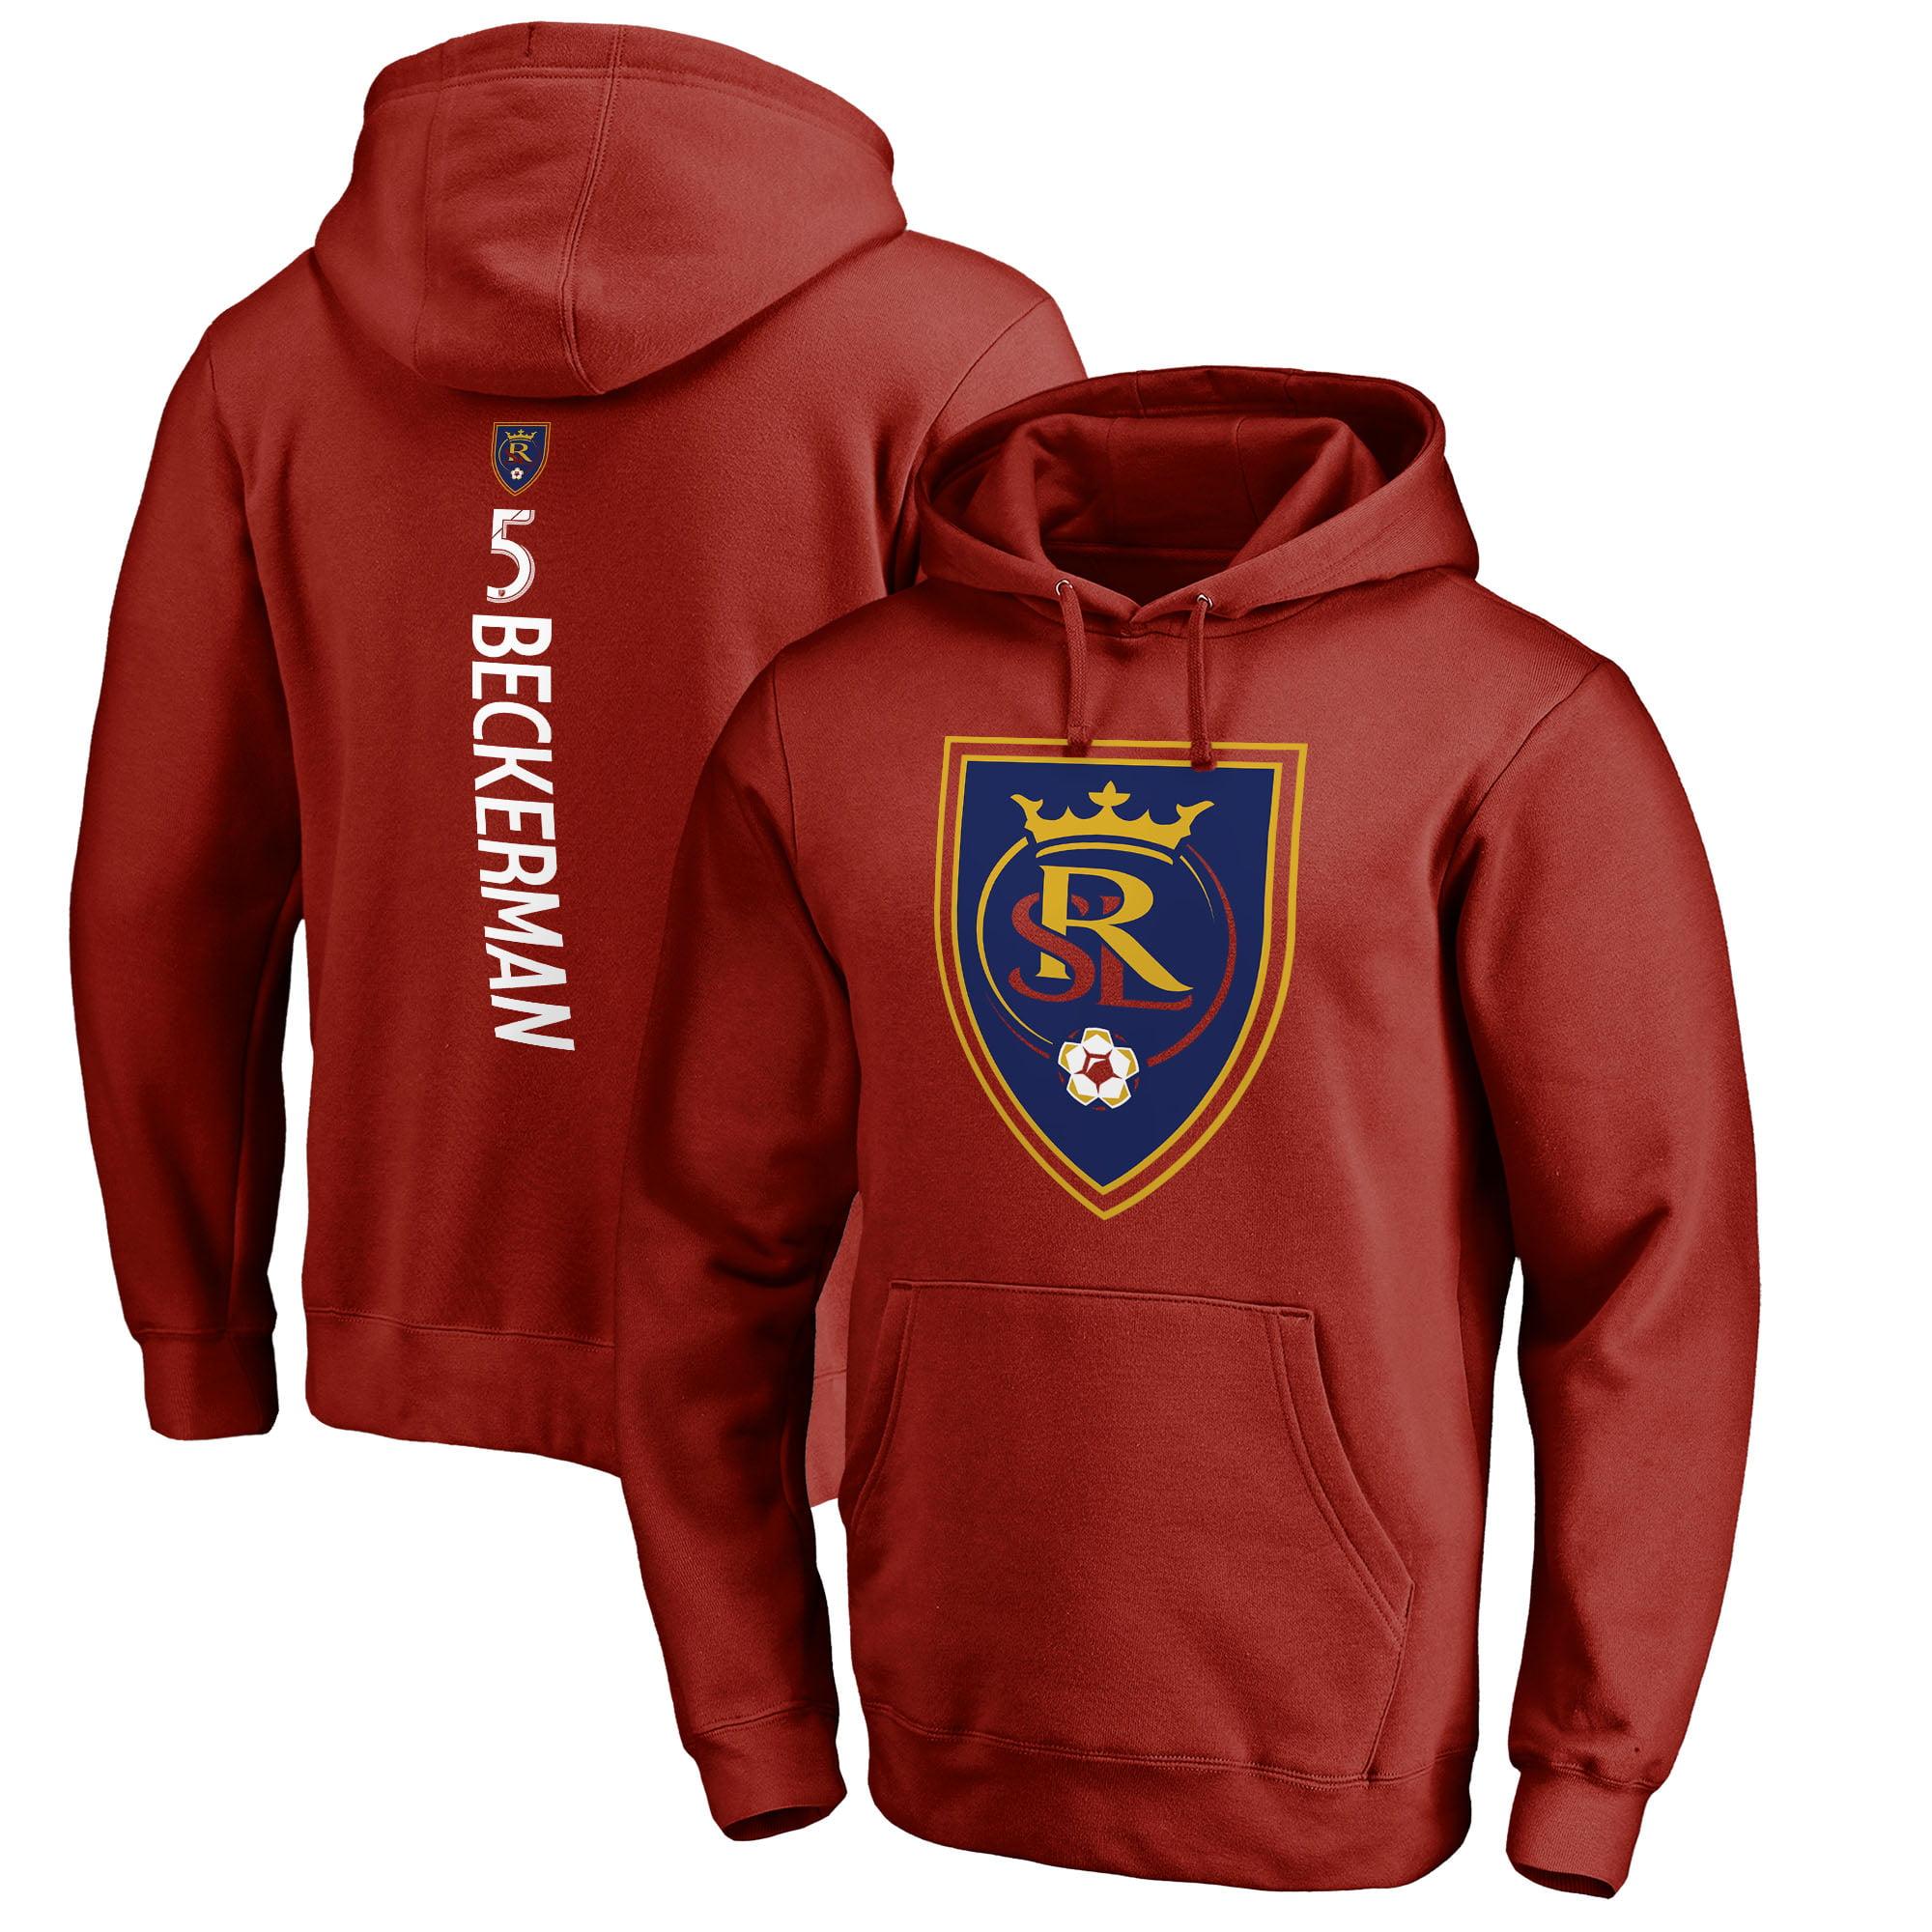 Kyle Beckerman Real Salt Lake Fanatics Branded Backer Name & Number Pullover Hoodie - Red